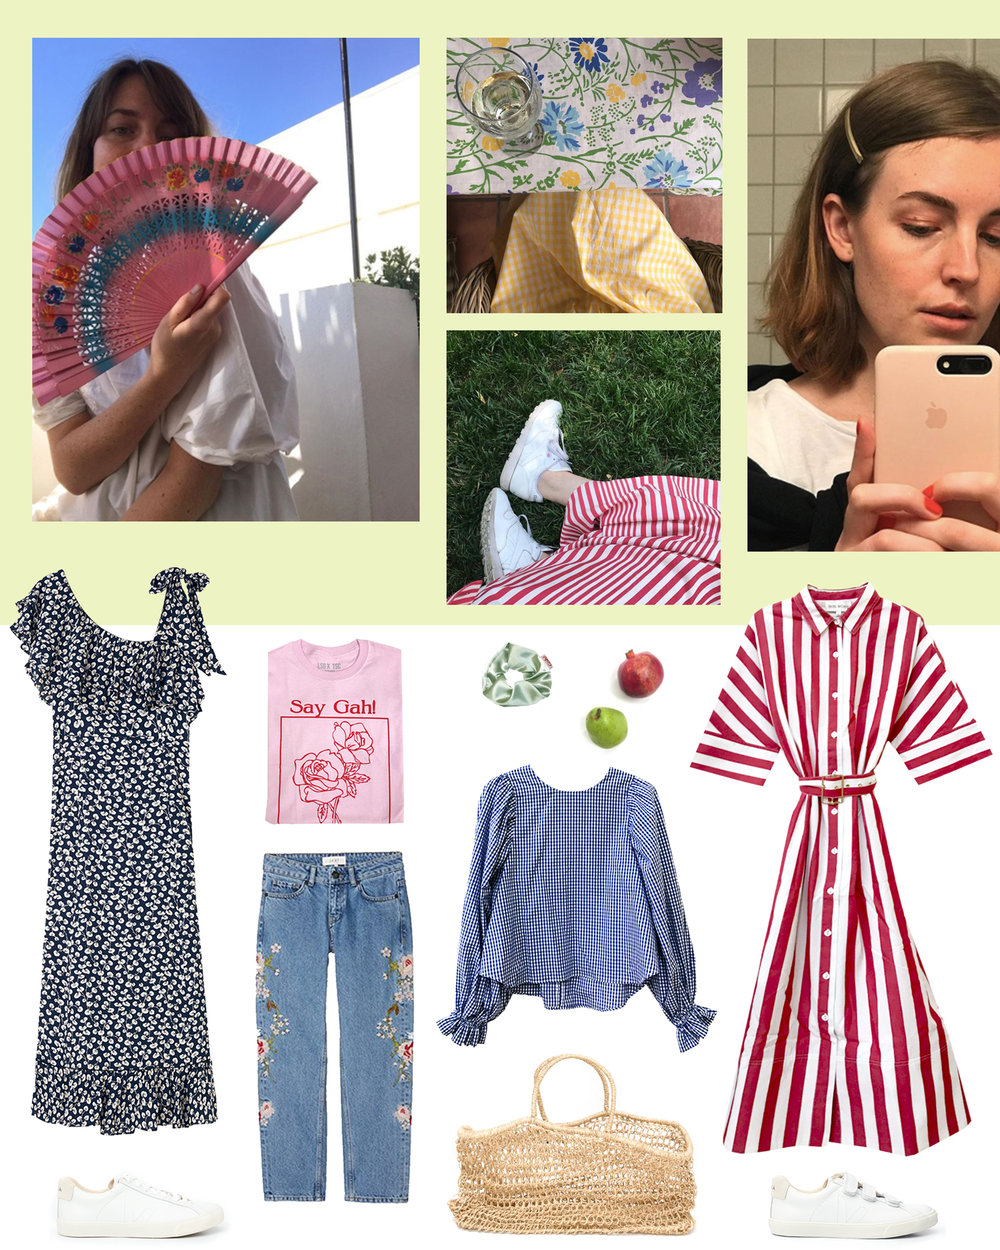 Lisa-Says-Gah-MuseMonday-Frida-Regeheim-Collage.jpg